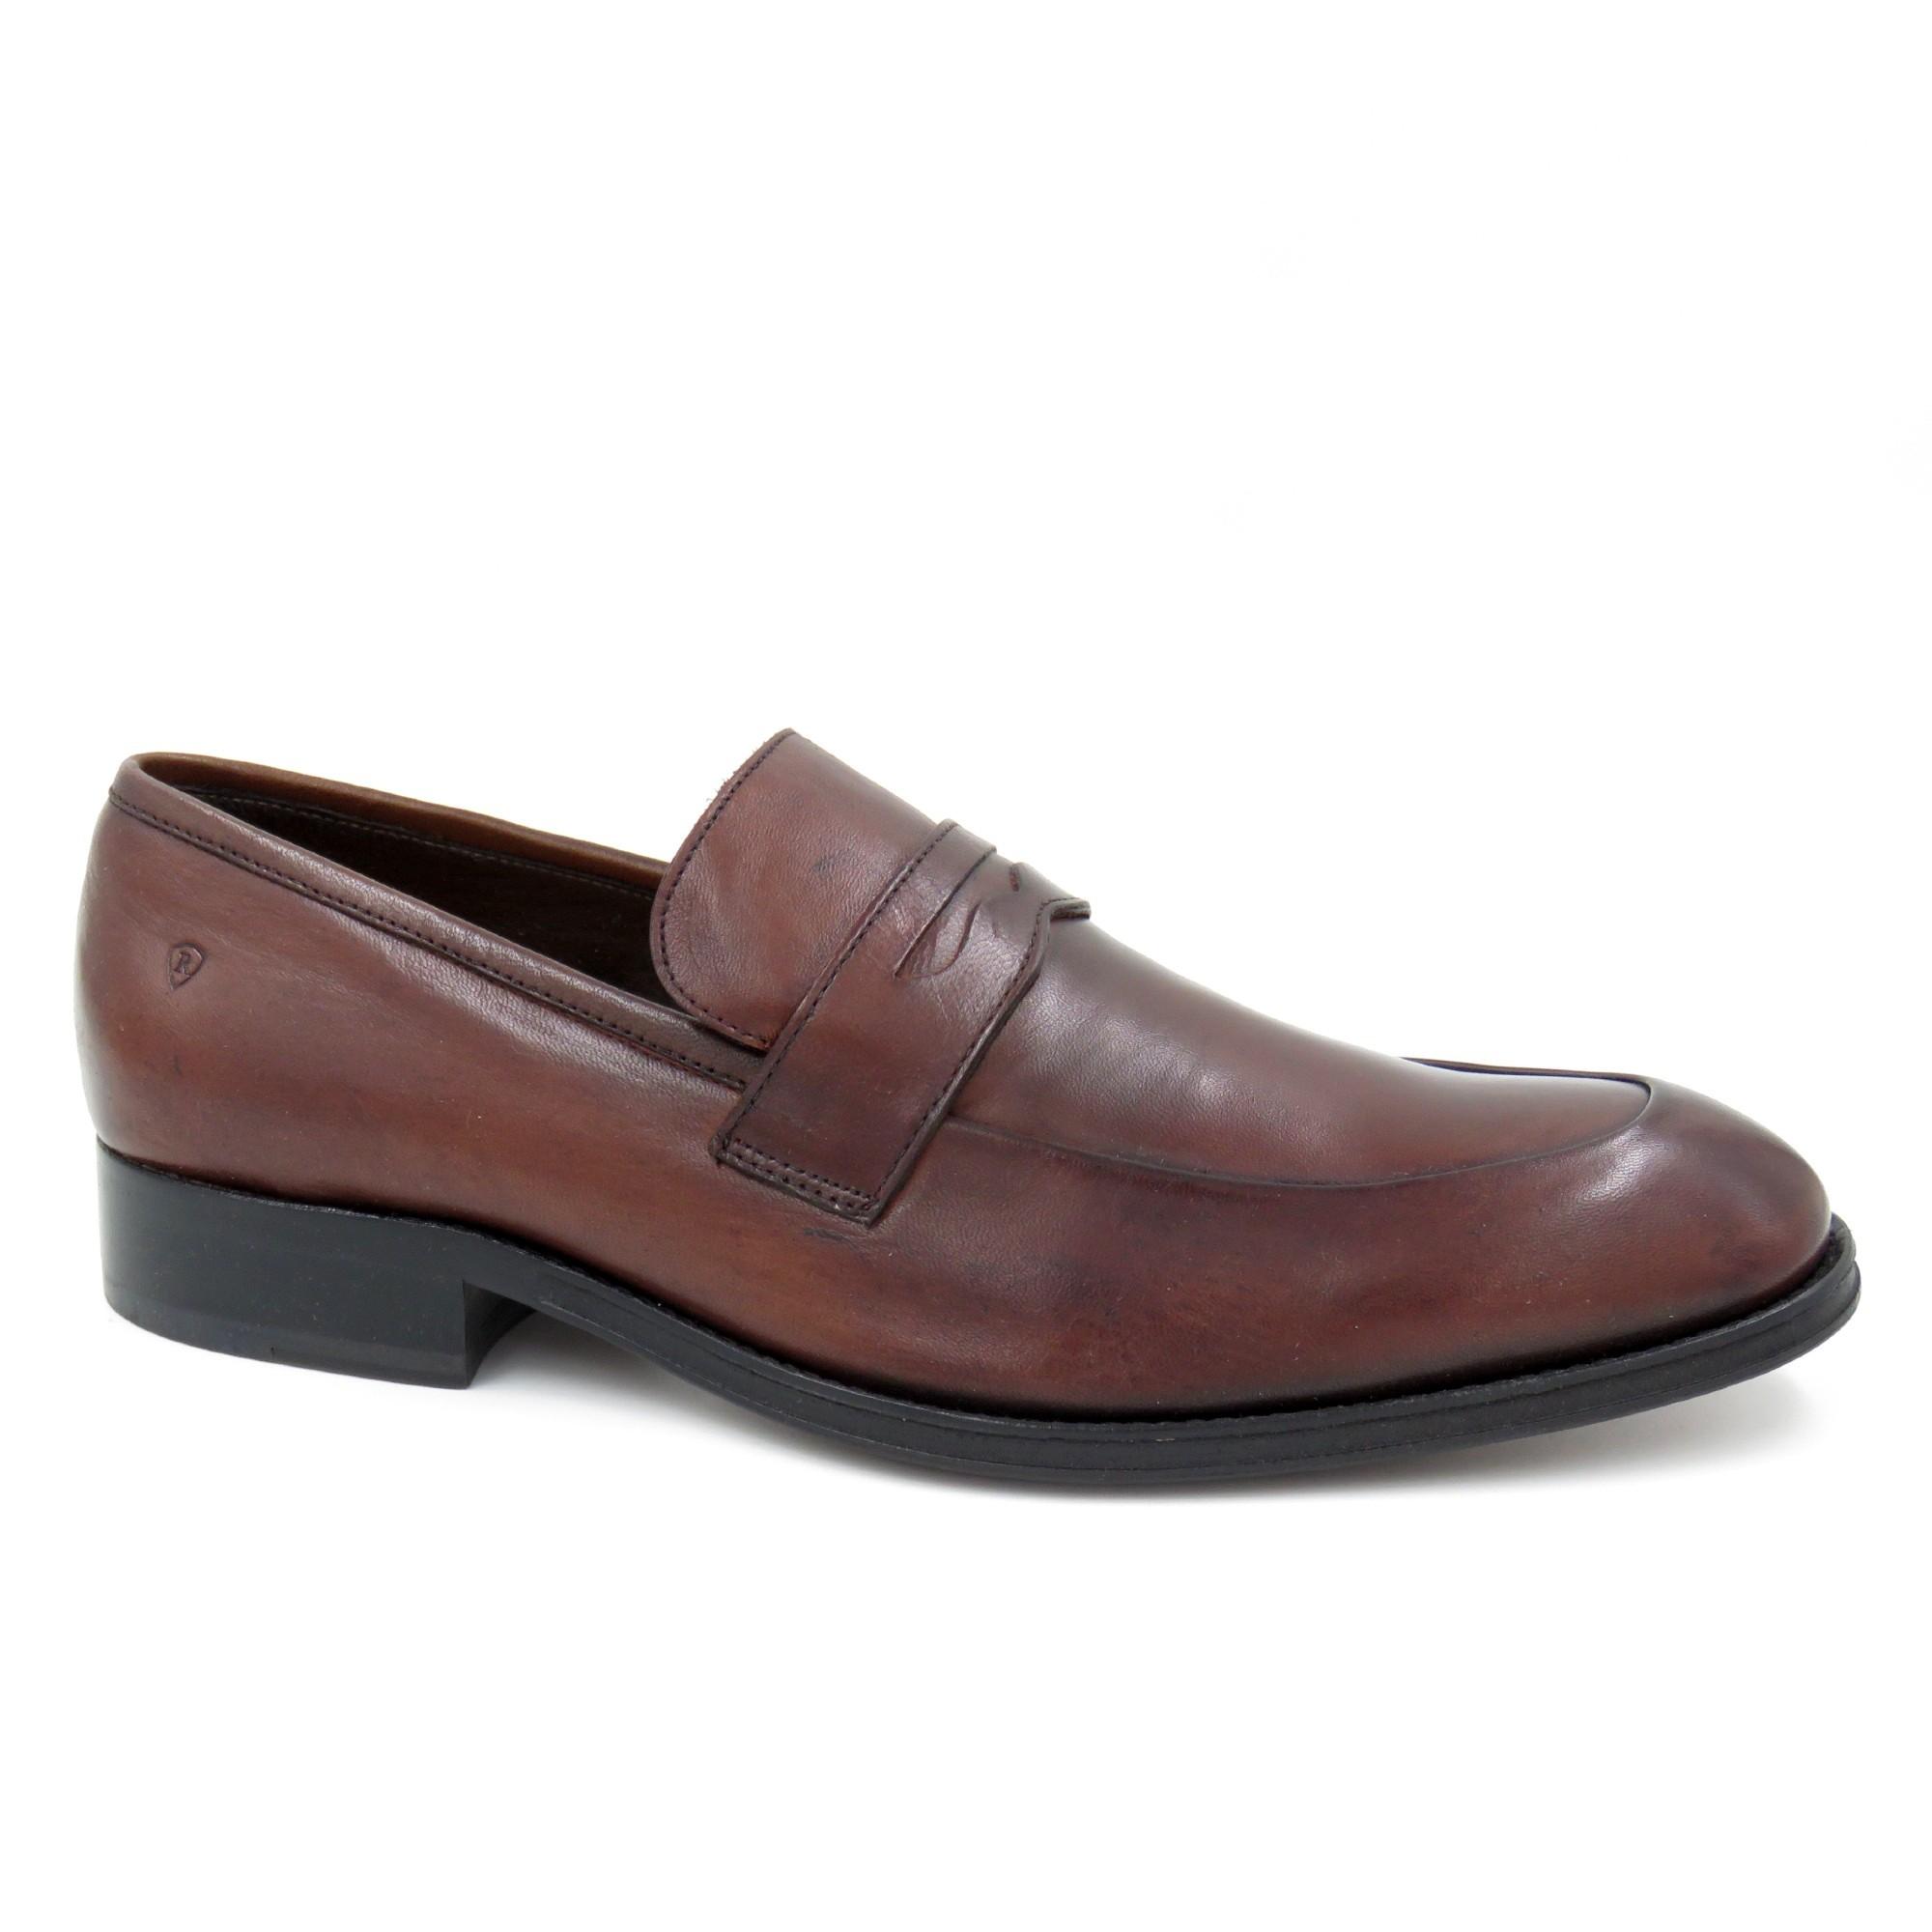 Sapato Calçar Sola Couro Cost Enluvada Front [334024]